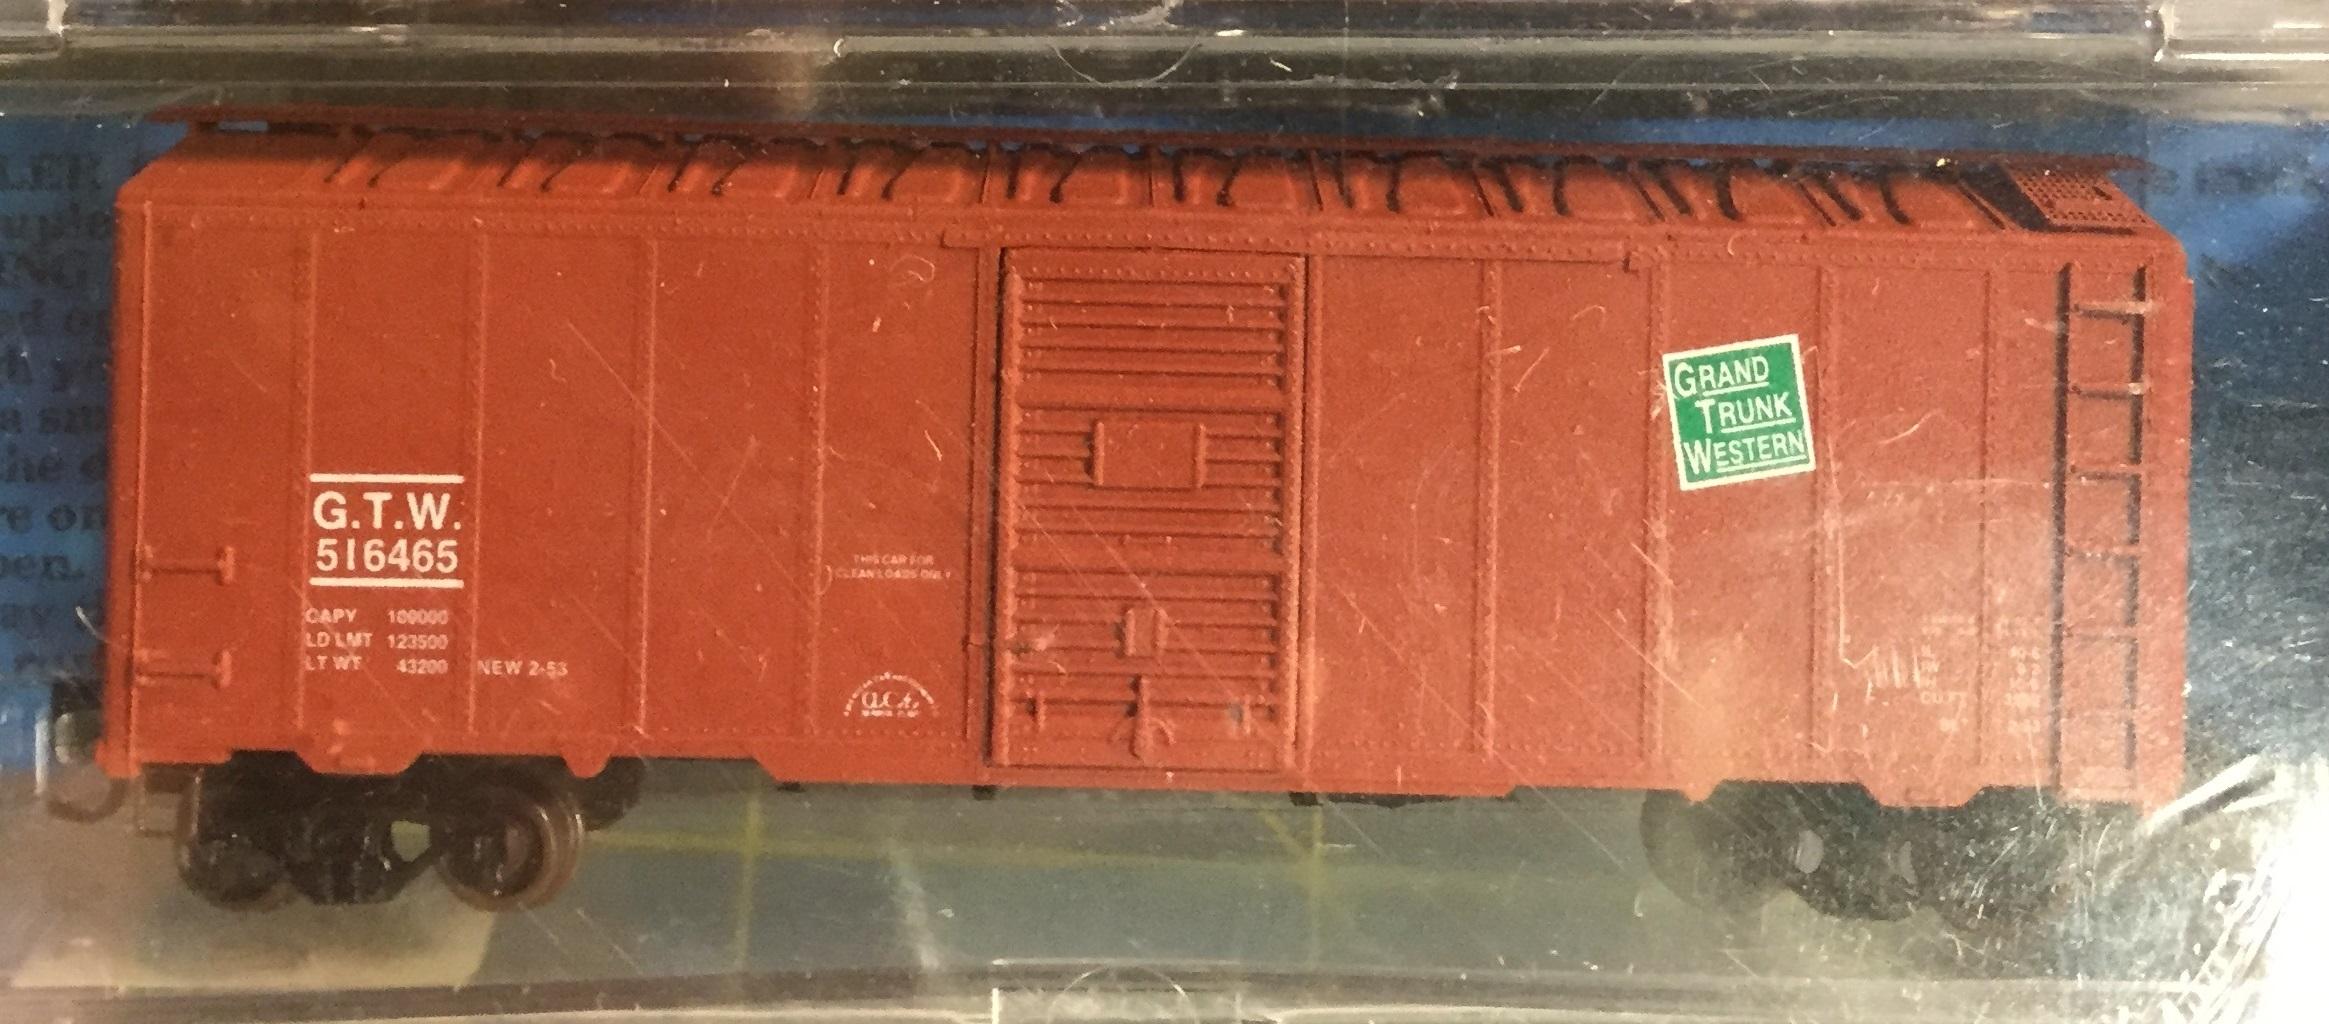 N Scale - Deluxe Innovations - 142102-2 - Boxcar, 40 Foot, AAR 1944 - Grand Trunk Western - 516465